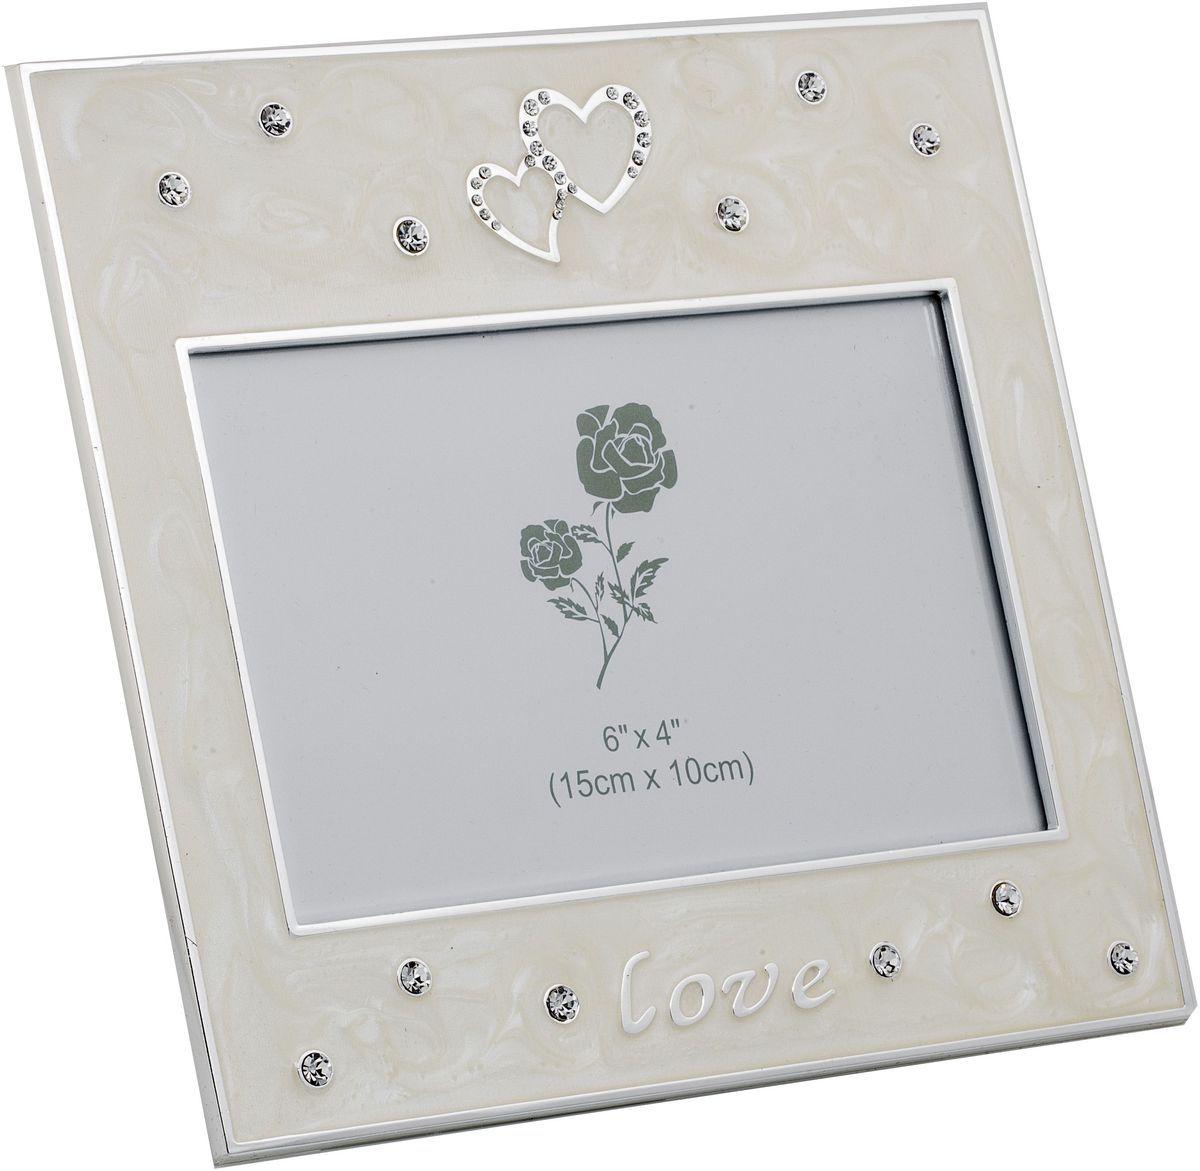 Фоторамка декоративная Platinum Love, 10 х 15 см. PF1417-4PLATINUM PF1417-4